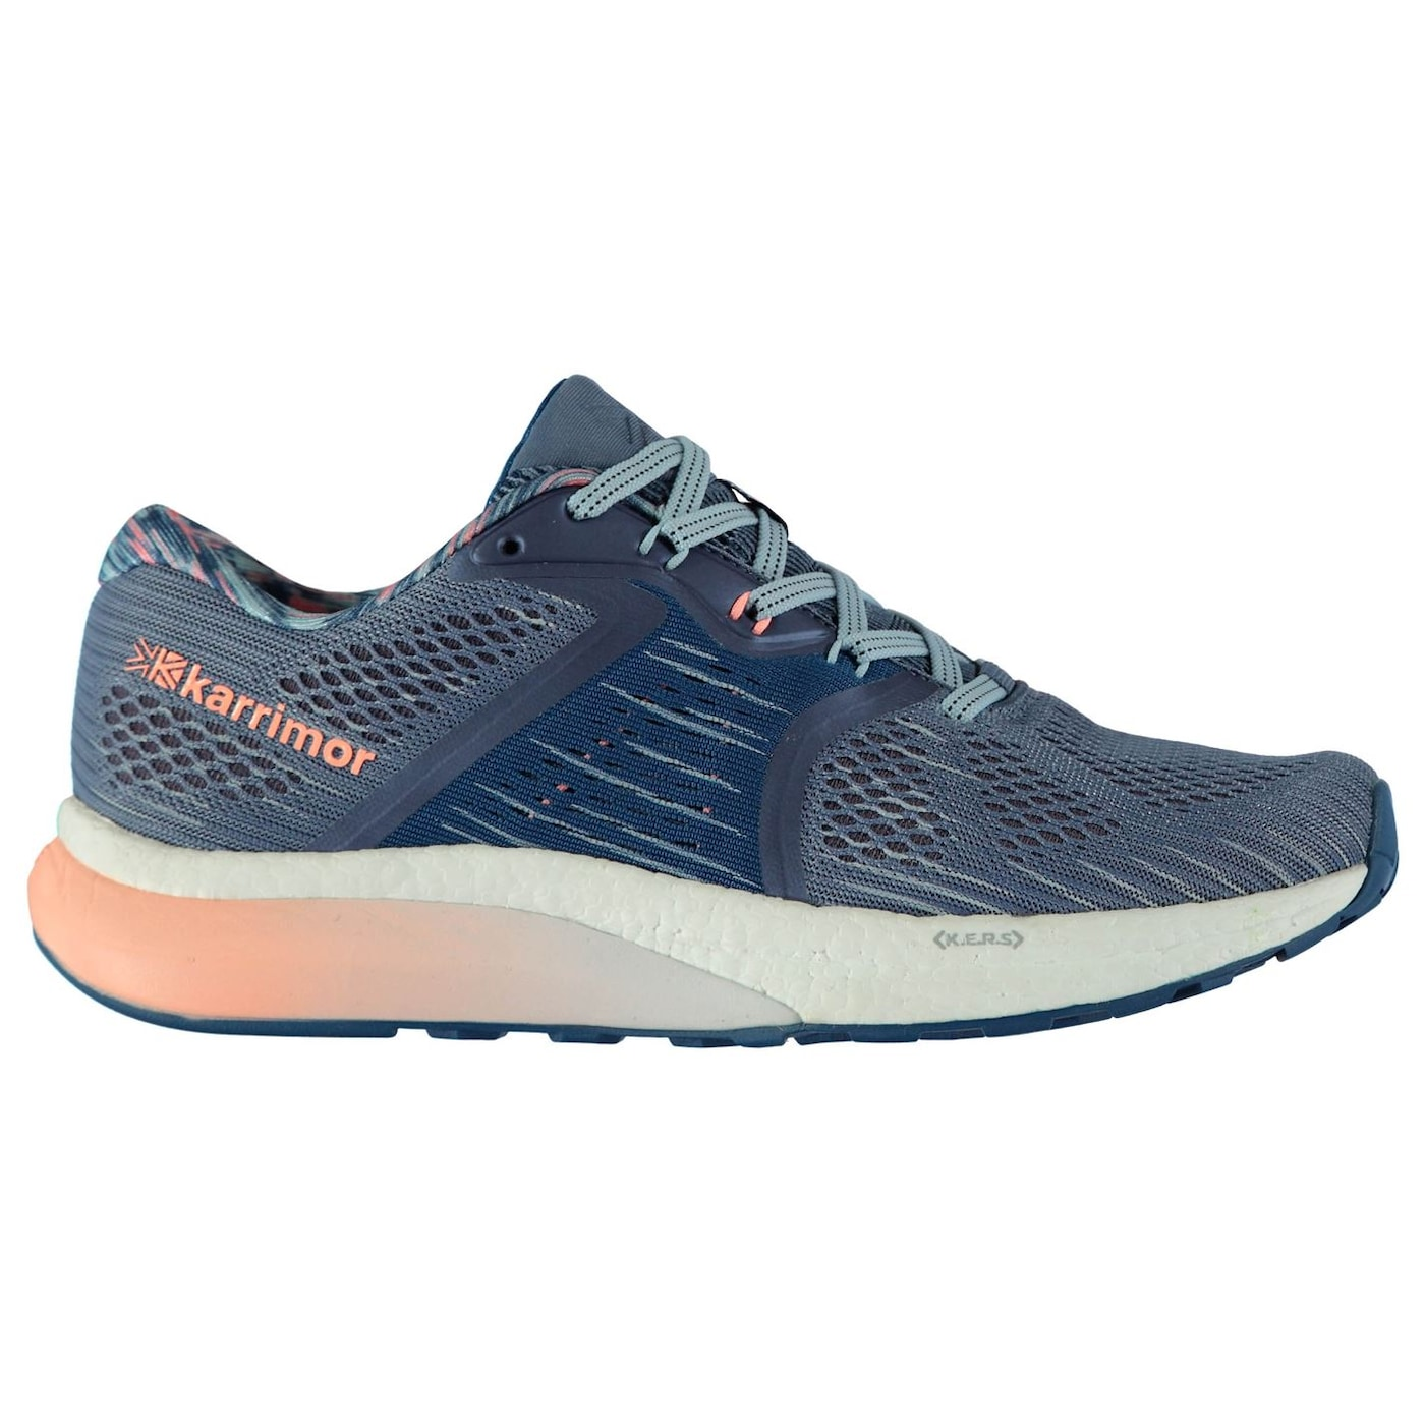 Karrimor Excel 3 Ld91 dámské běžecké boty